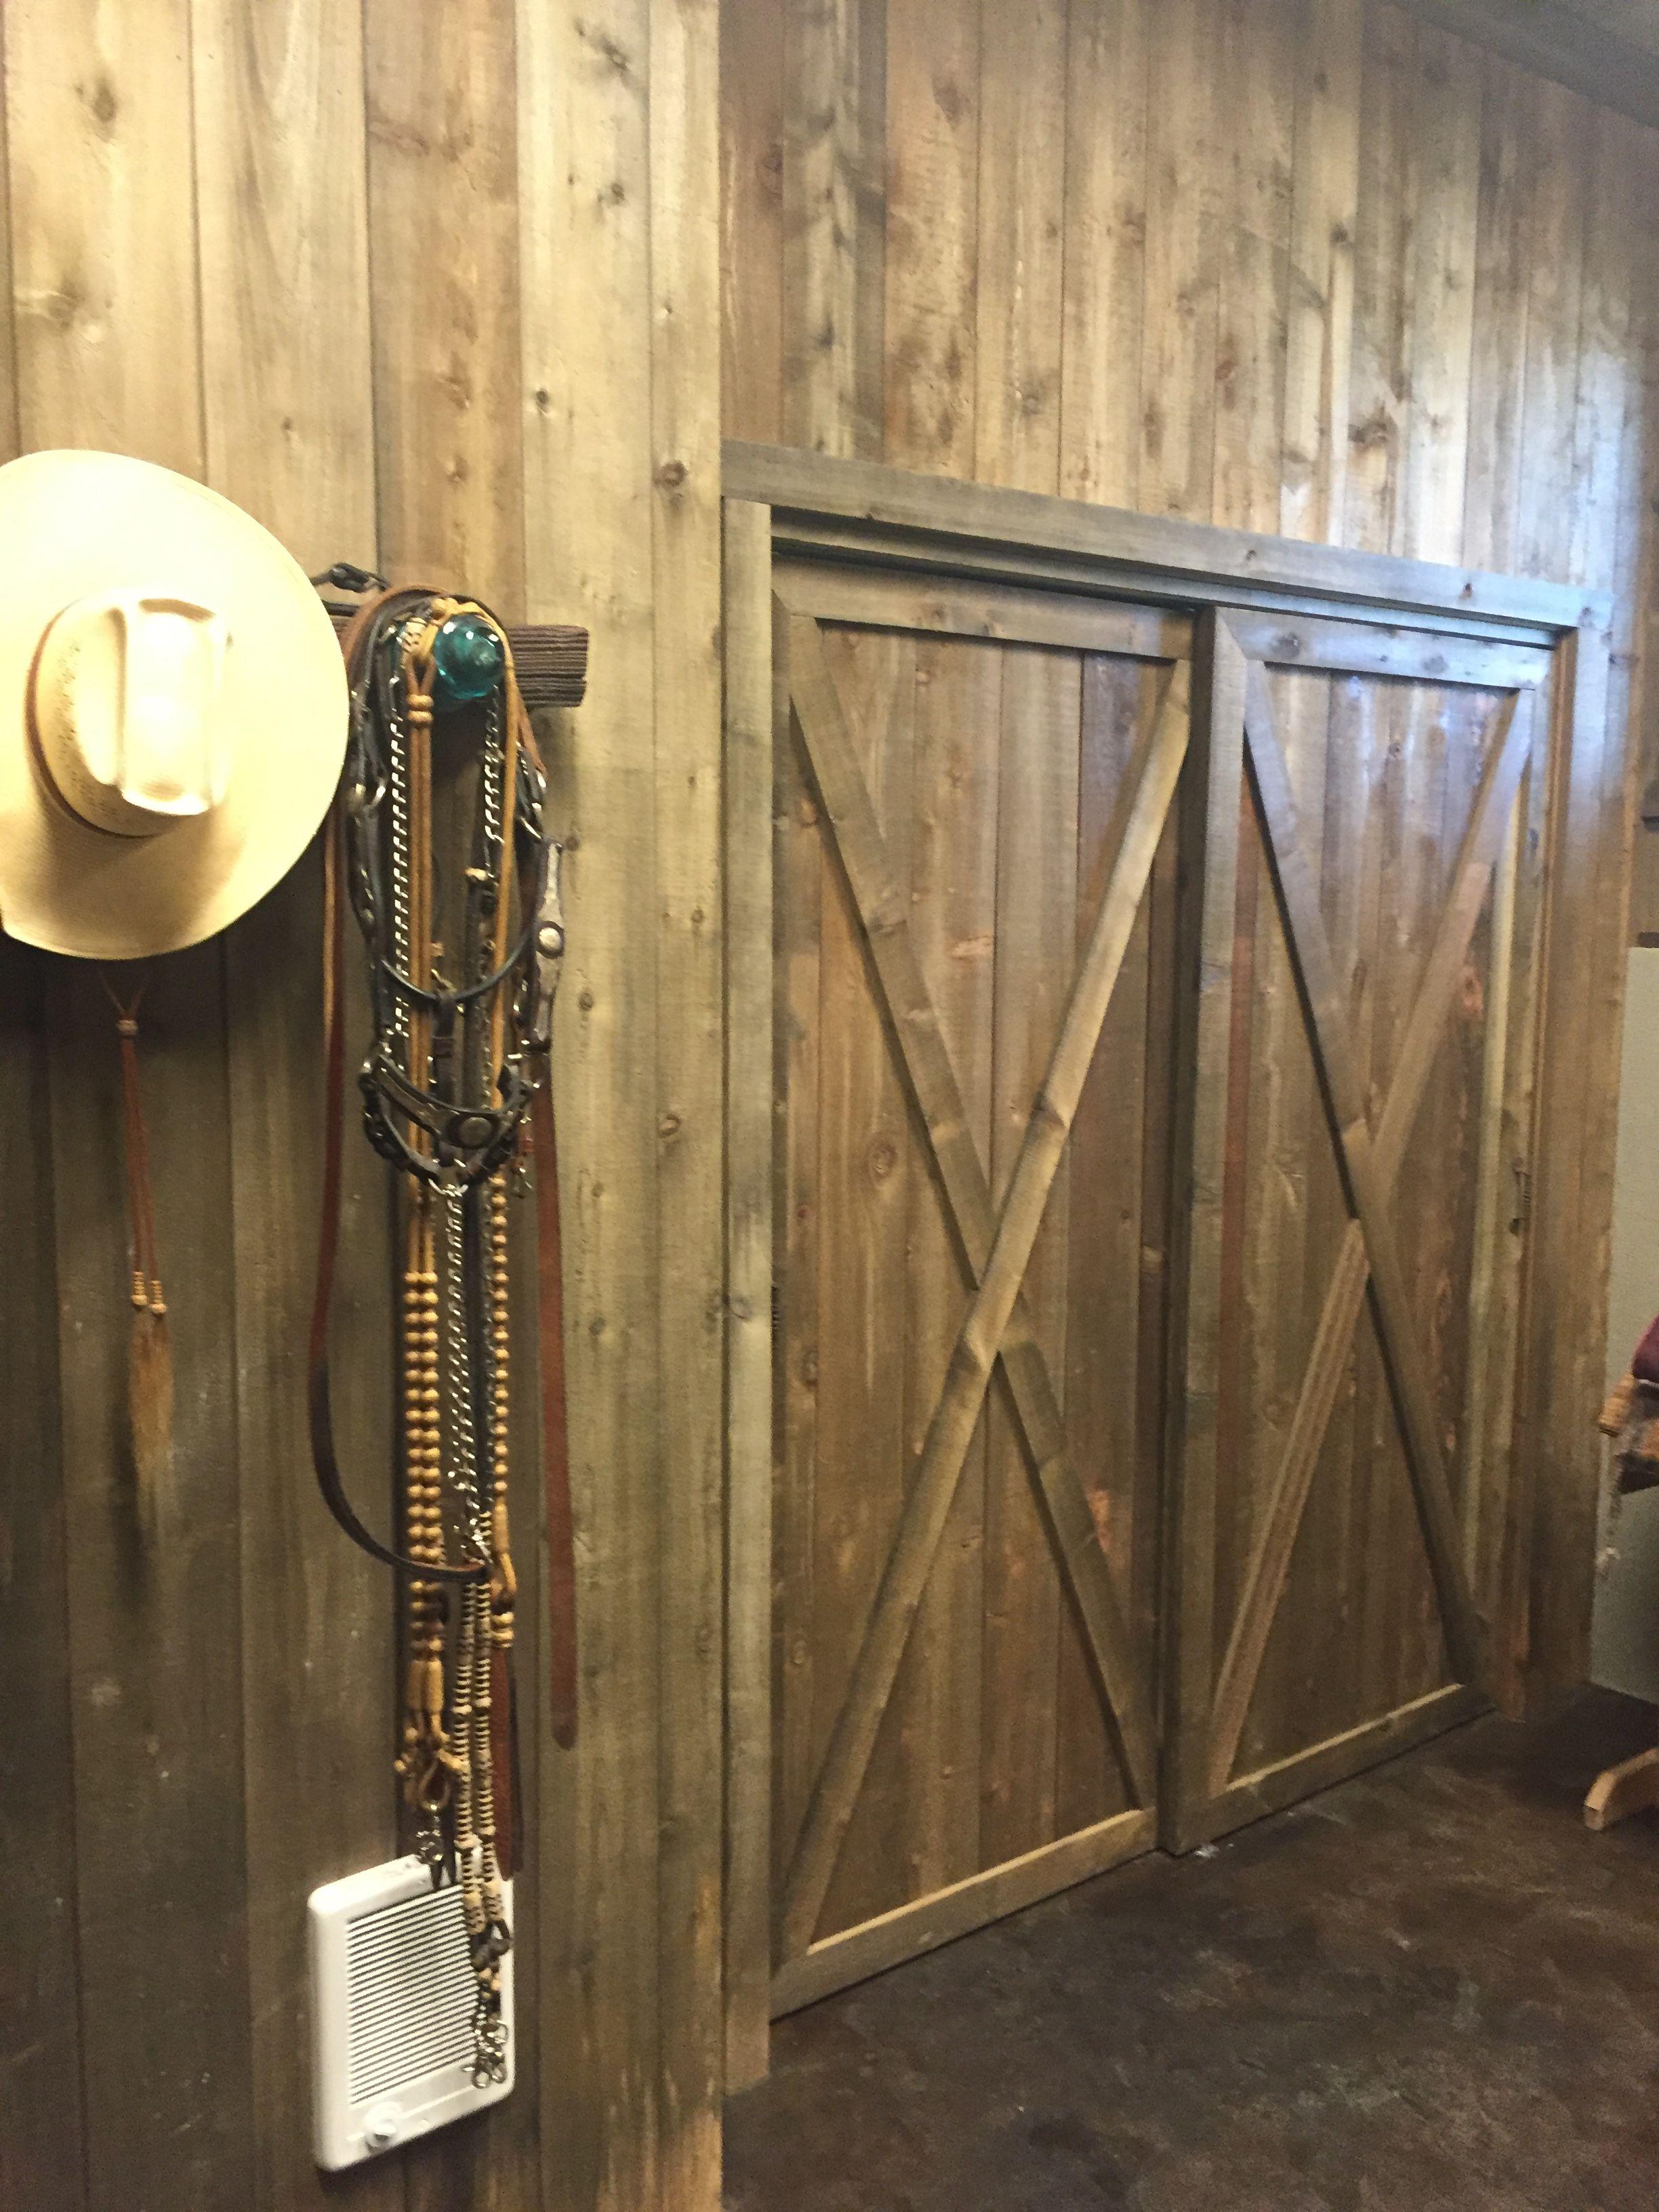 A Really Great Project From Vicki Bass She Used Our 1x8 Cedar Shiplap To Make Her Barn Look Like A Million Bucks Check Cedar Siding Cedar Shiplap Diy Shiplap